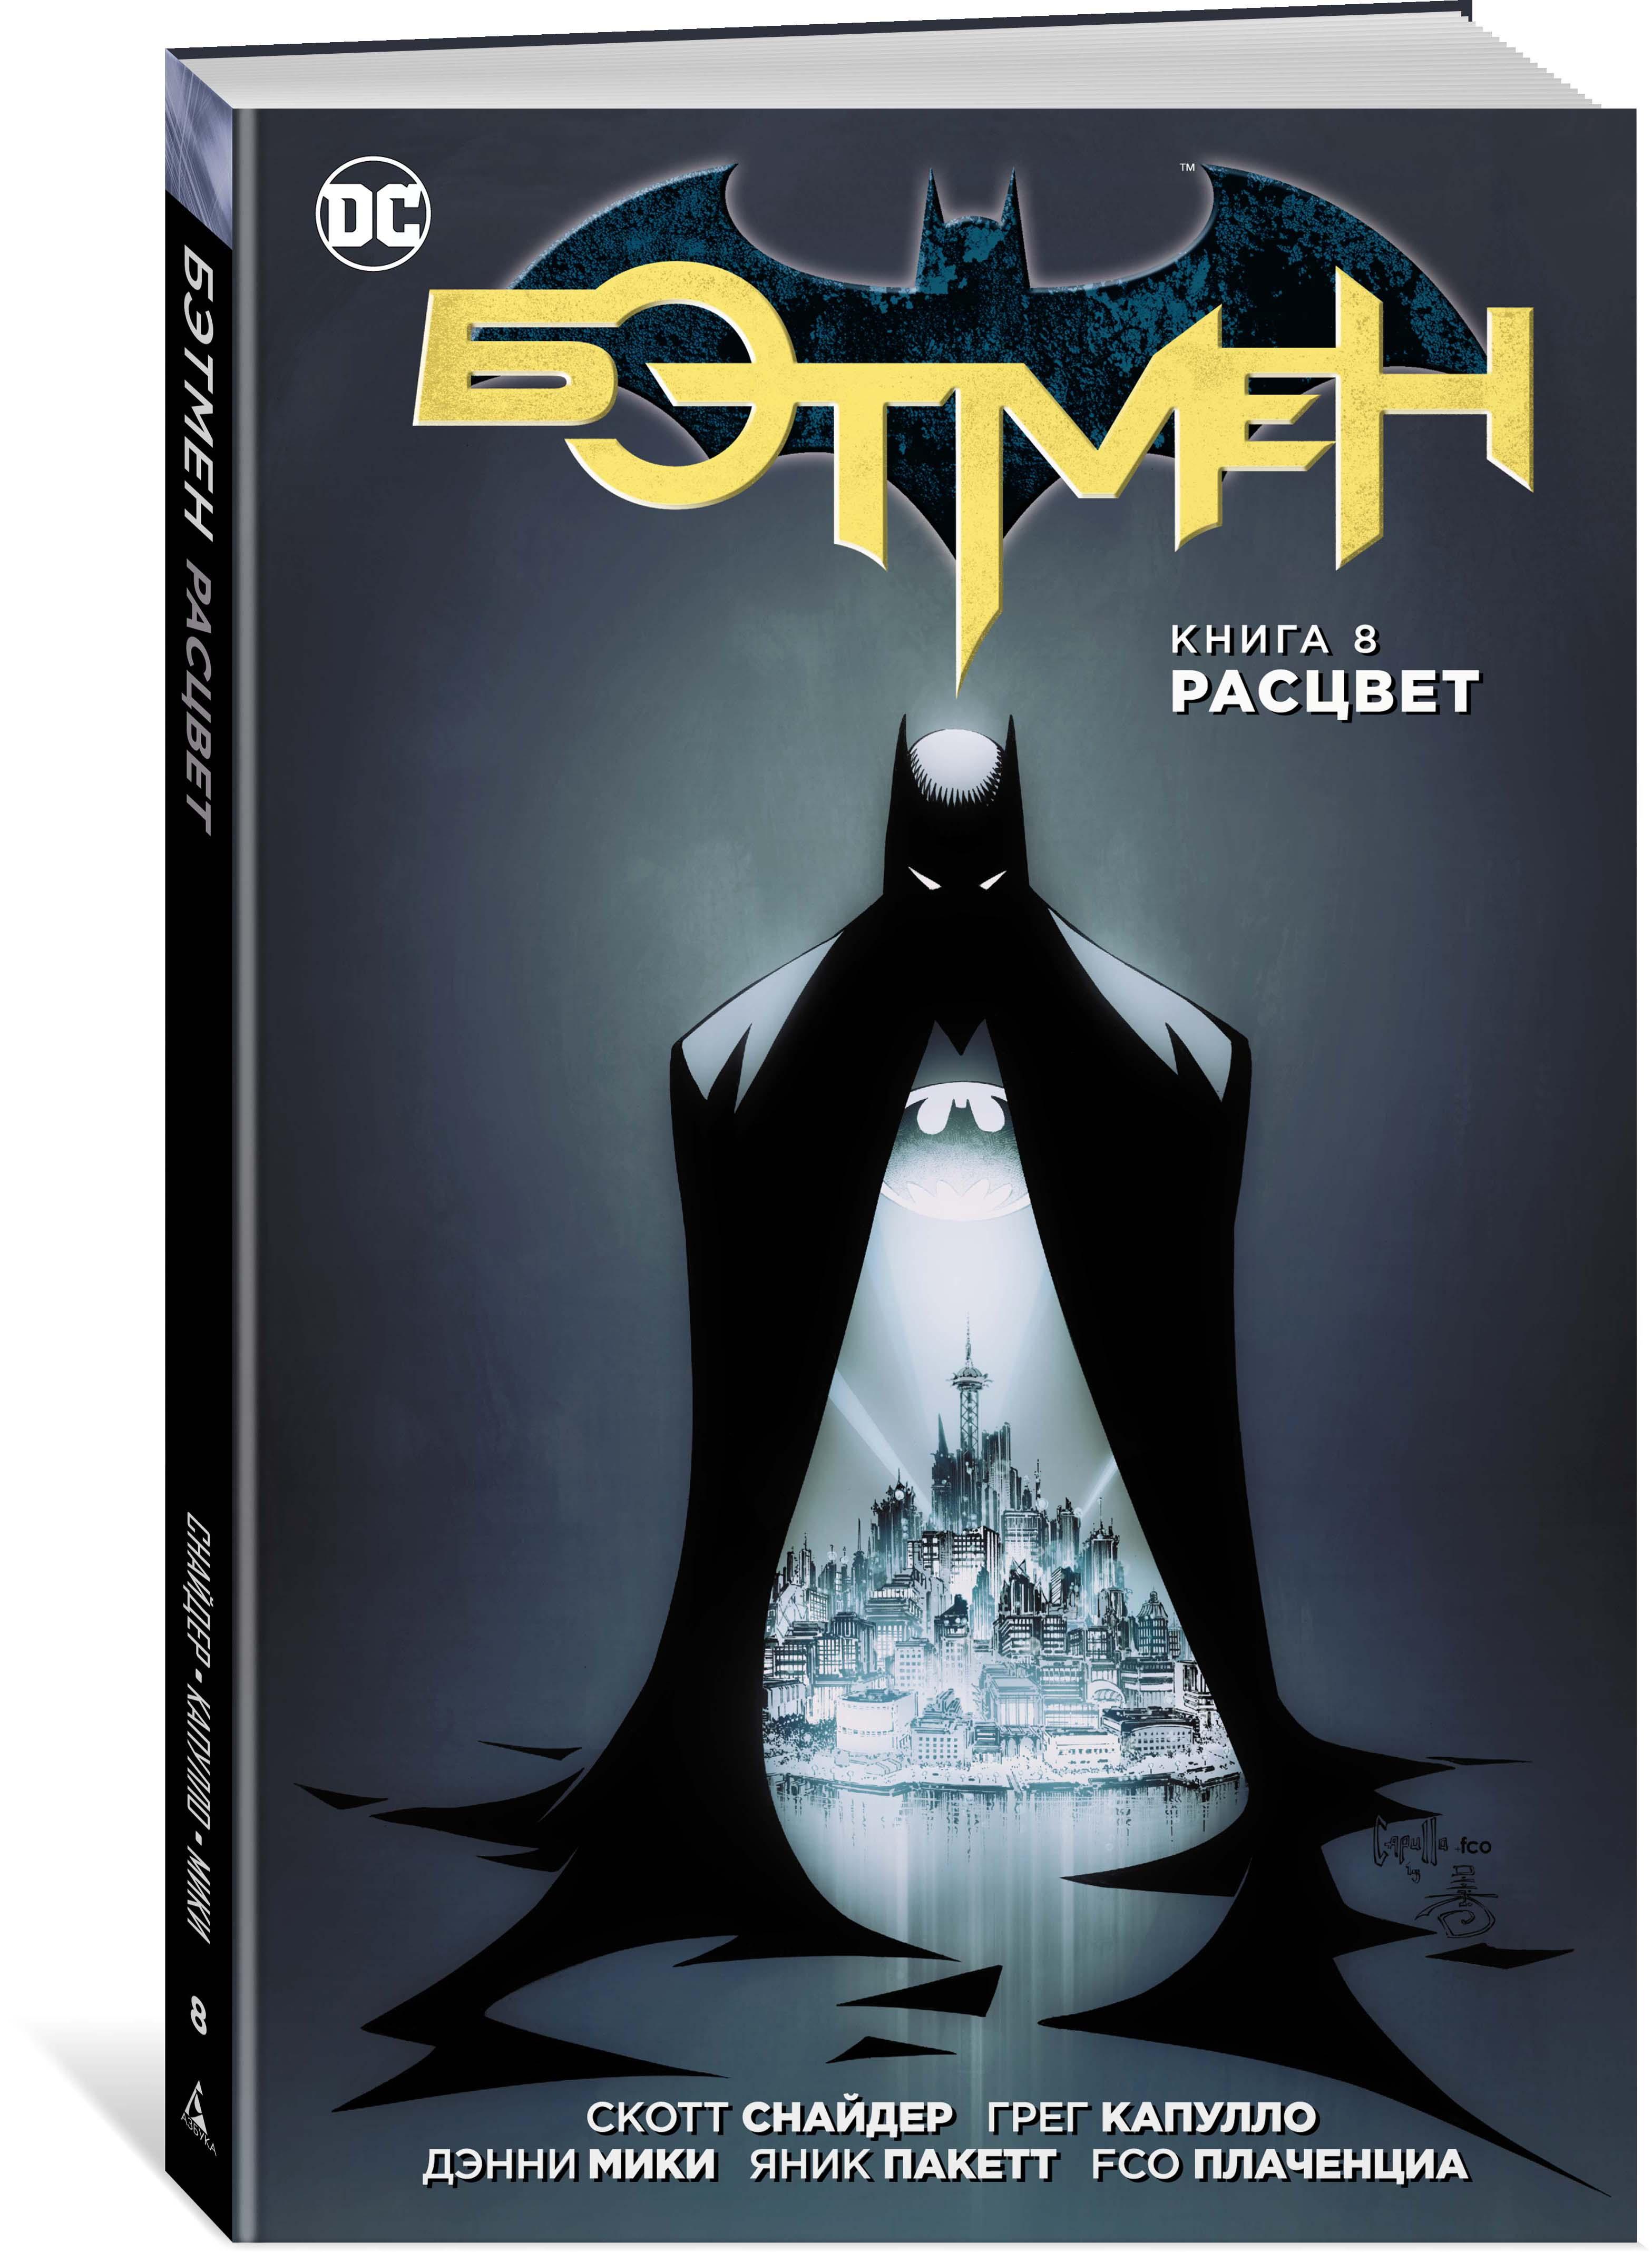 Скотт Снайдер Бэтмен. Книга 8. Расцвет дини пол крамер дон фаучер уэйн бэтмен detective comics убойная прогулка